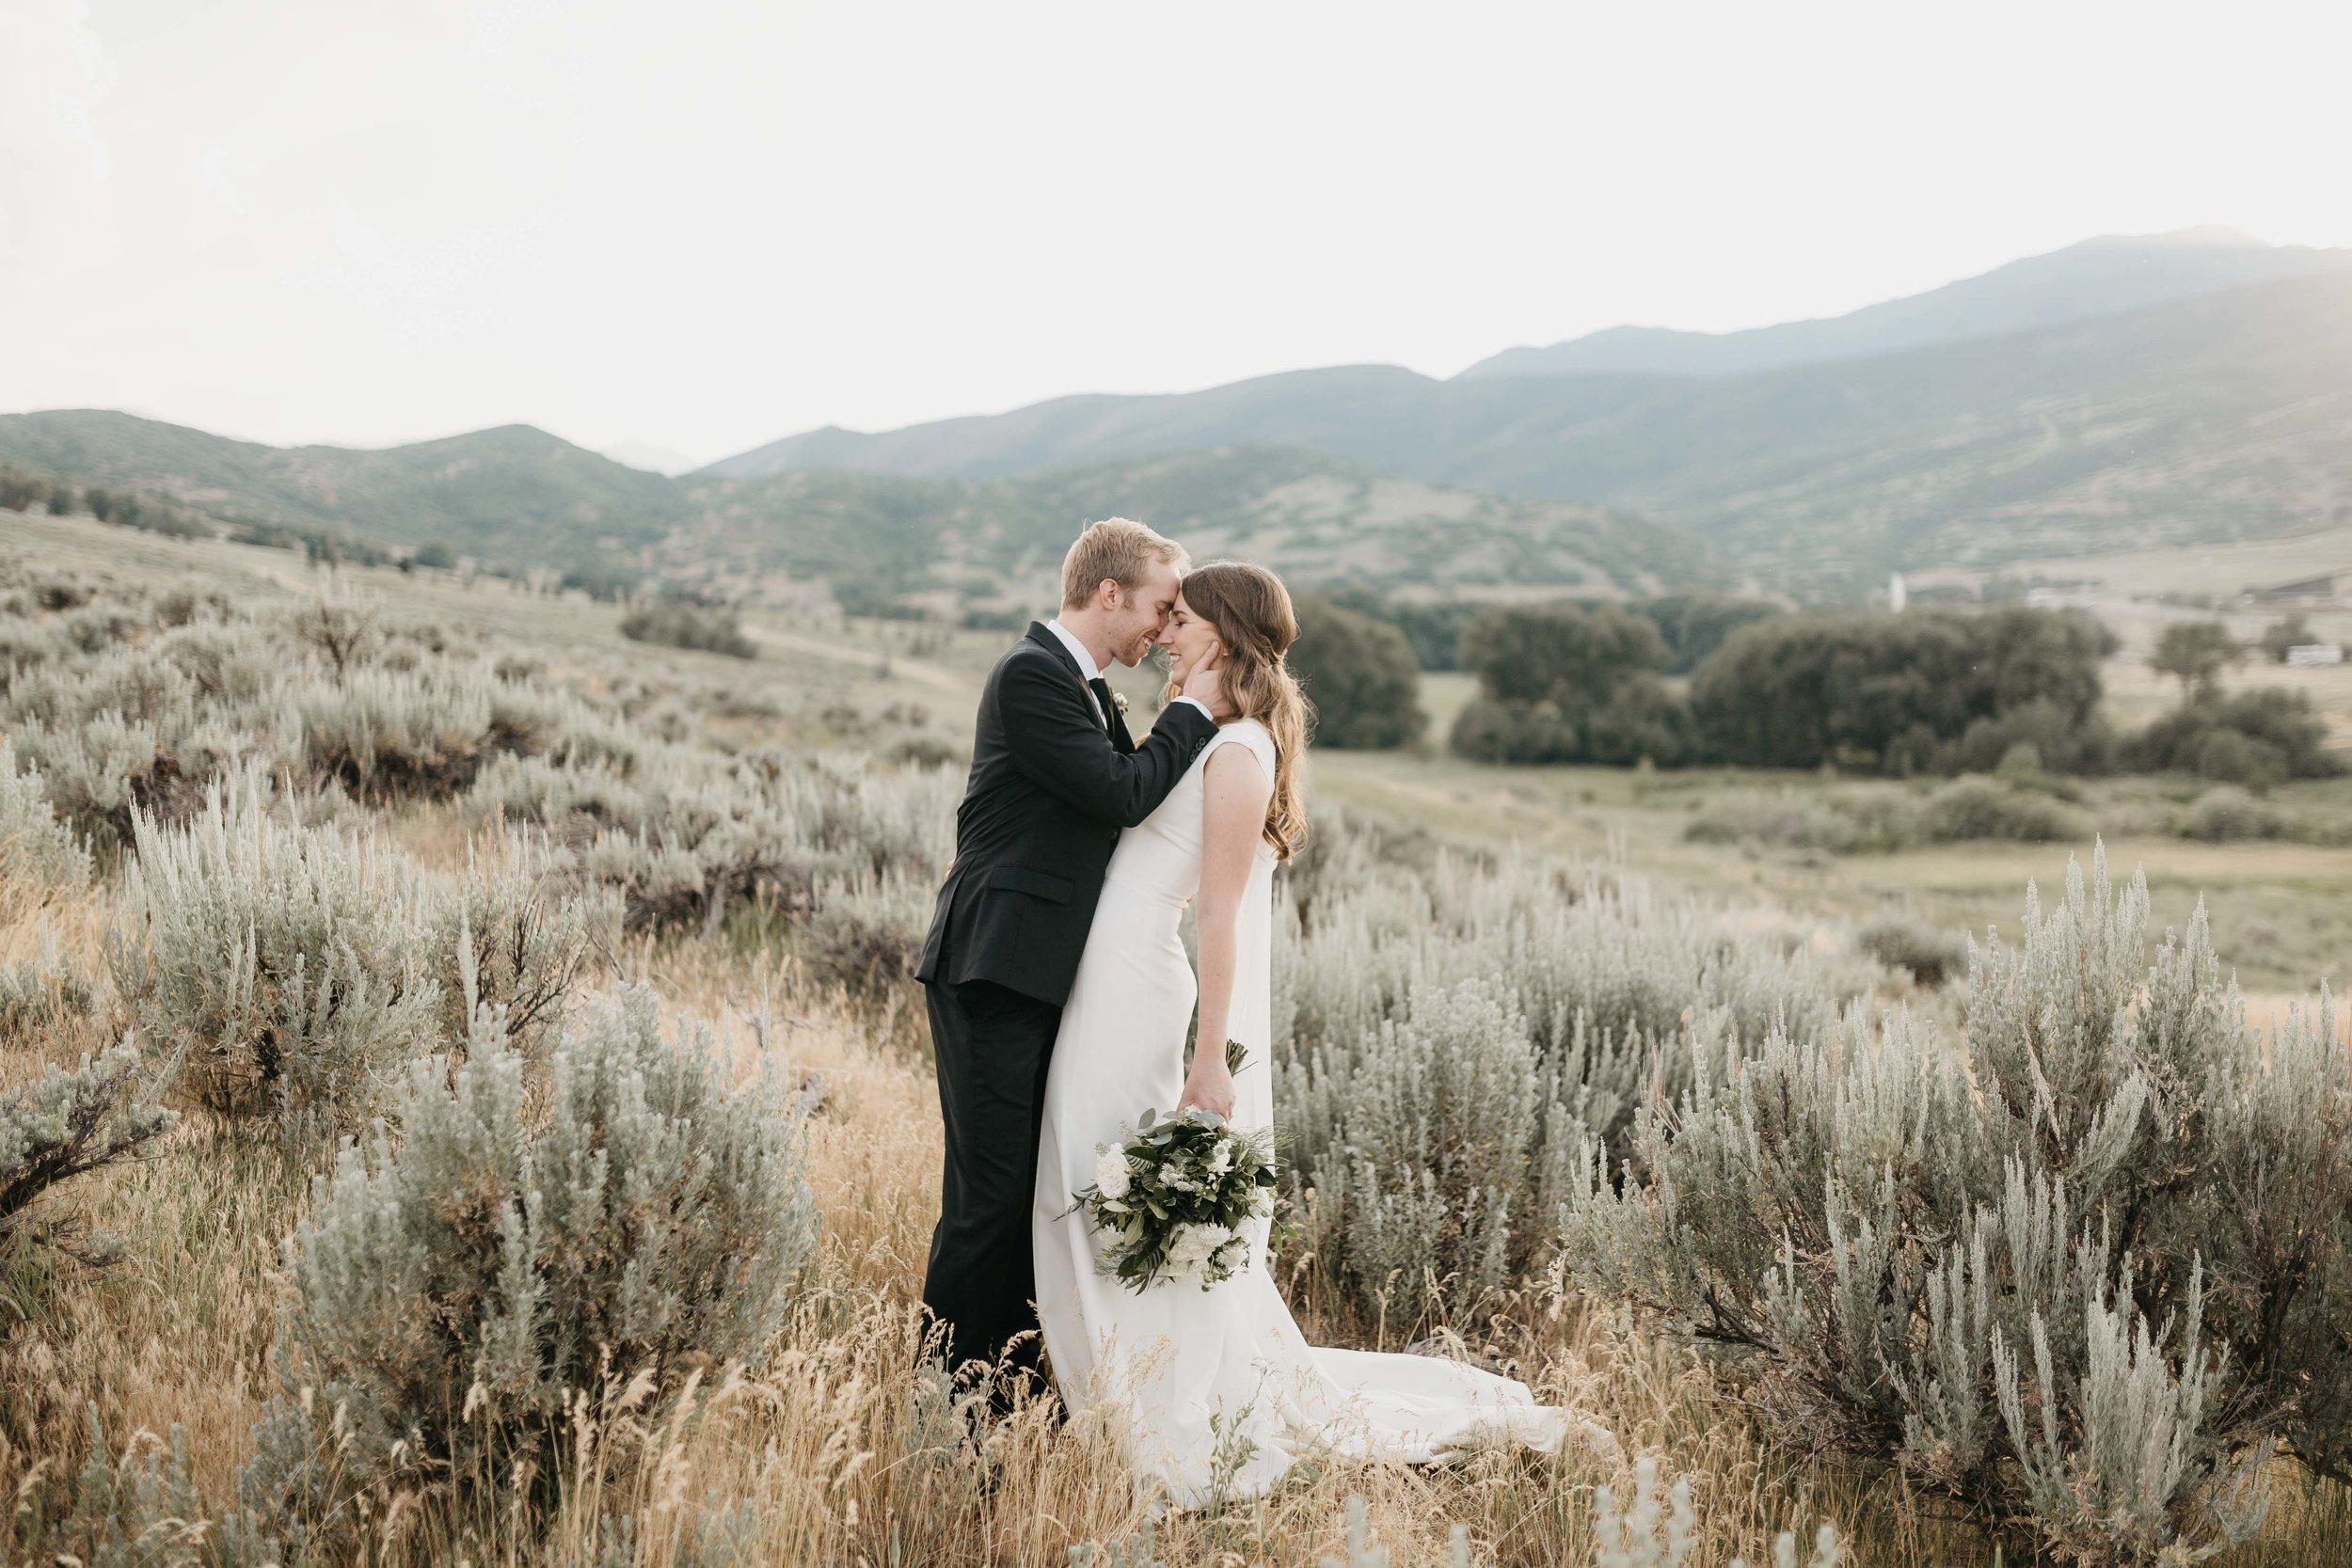 Utah-Wedding-Utah-Photographer-11.jpg